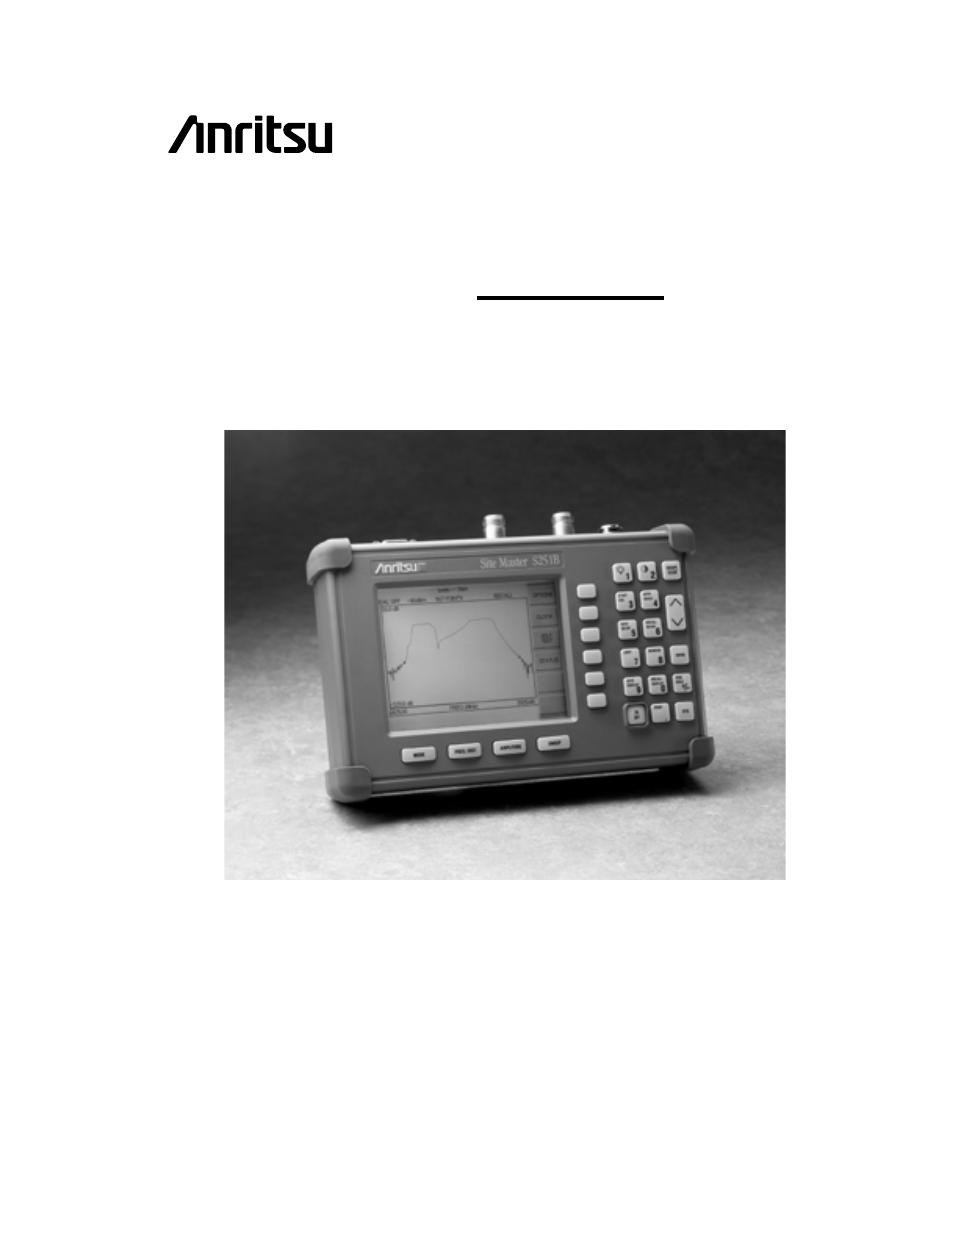 anritsu s251b user manual 84 pages rh manualsdir com Instruction Manual Example User Guide Template